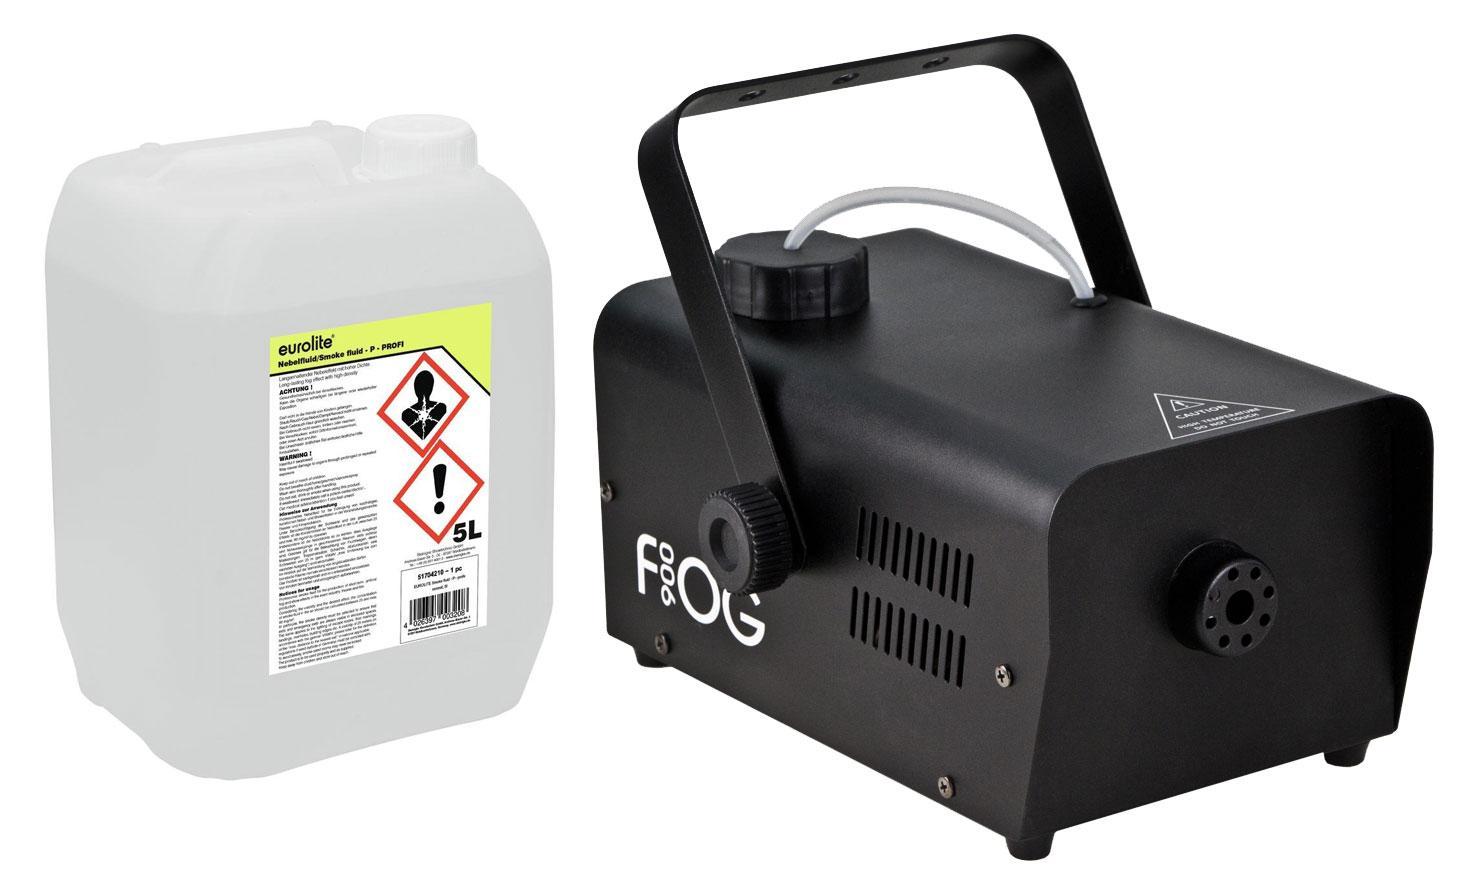 Nebeleffekte - Involight FOG 900 Nebelmaschinen Set inkl. Smoke Fluid, 5L - Onlineshop Musikhaus Kirstein